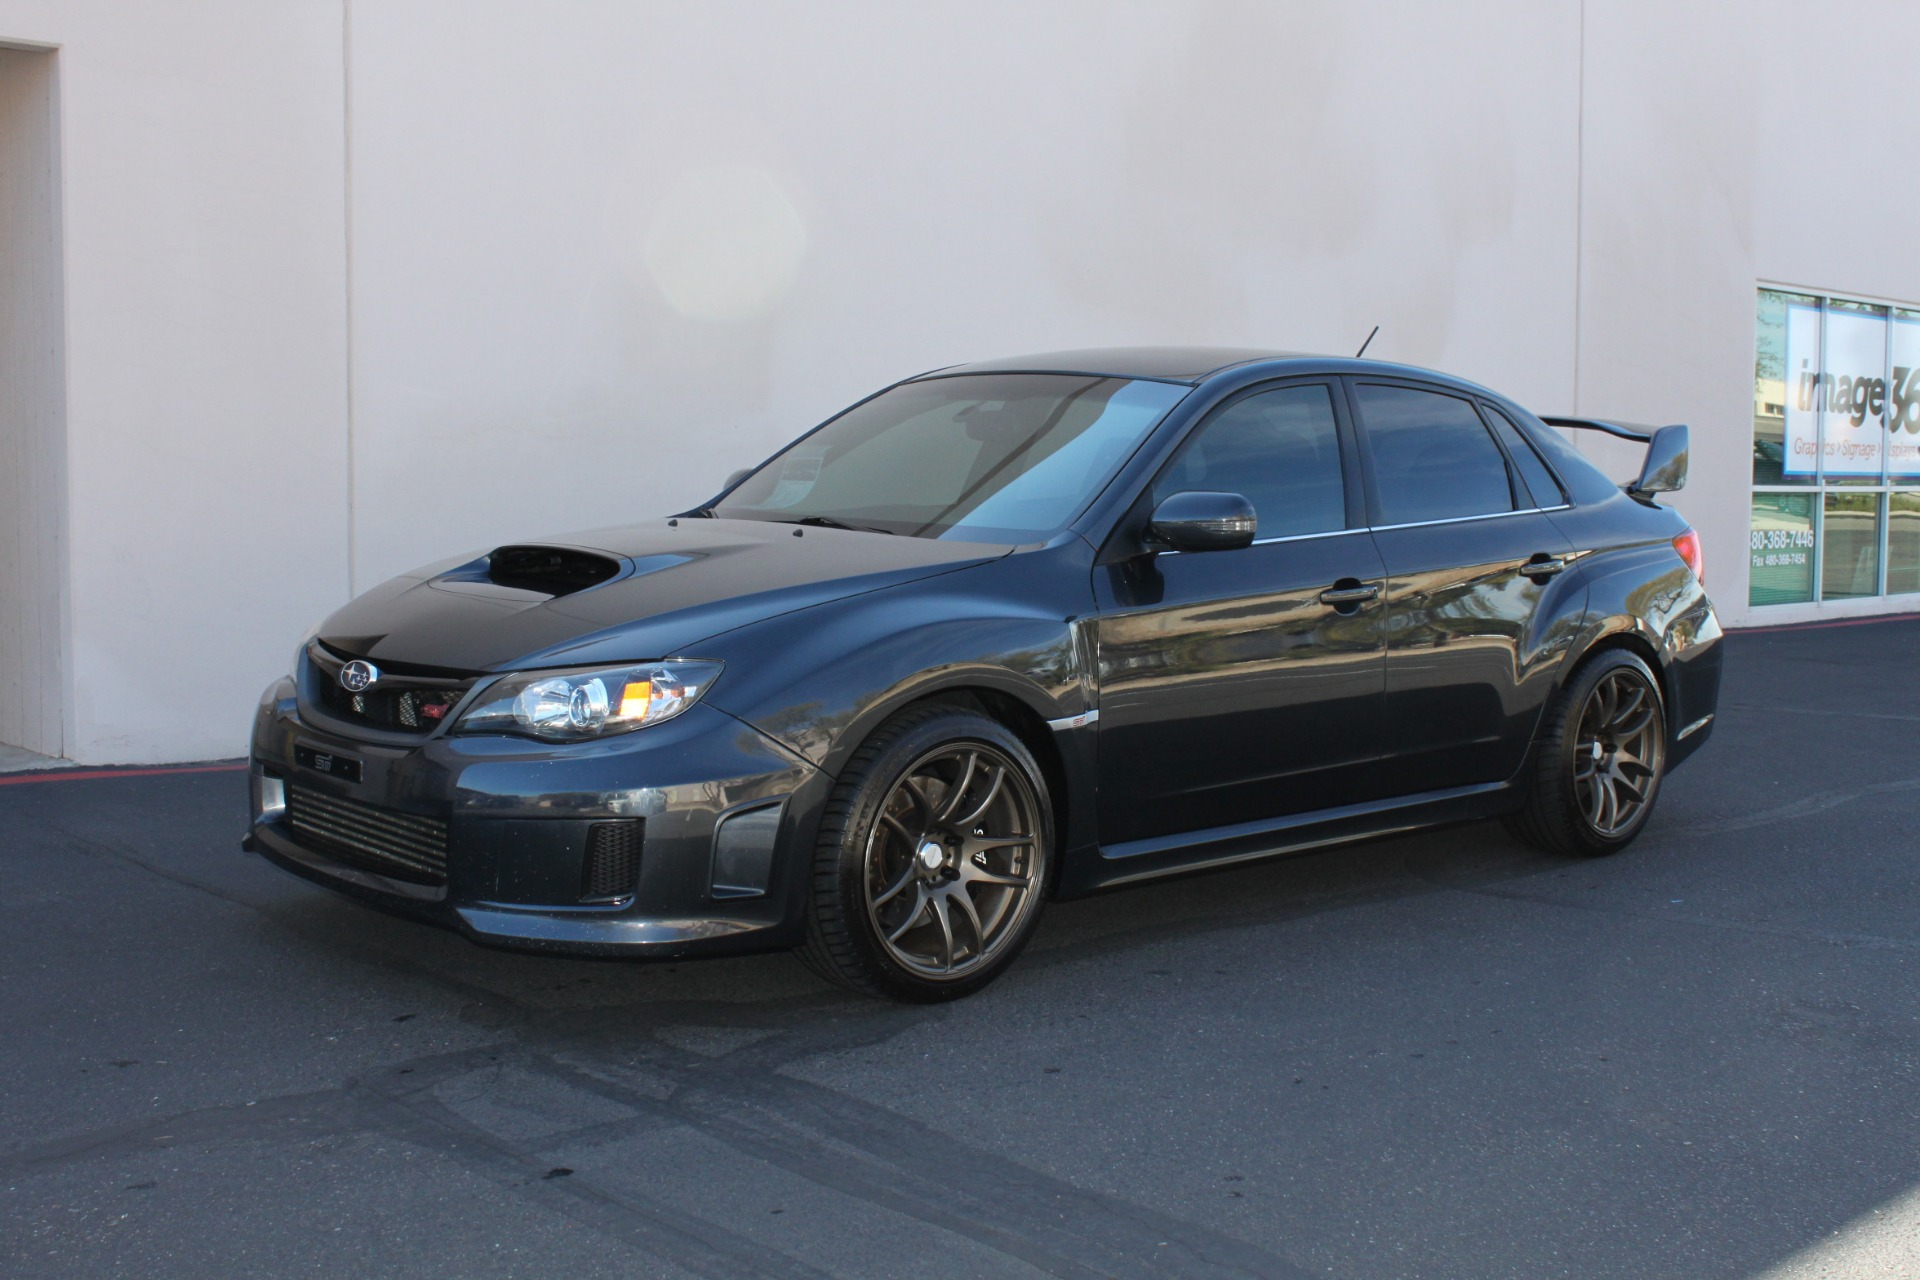 Used-2011-Subaru-Impreza-Sedan-WRX-STI-Ferrari